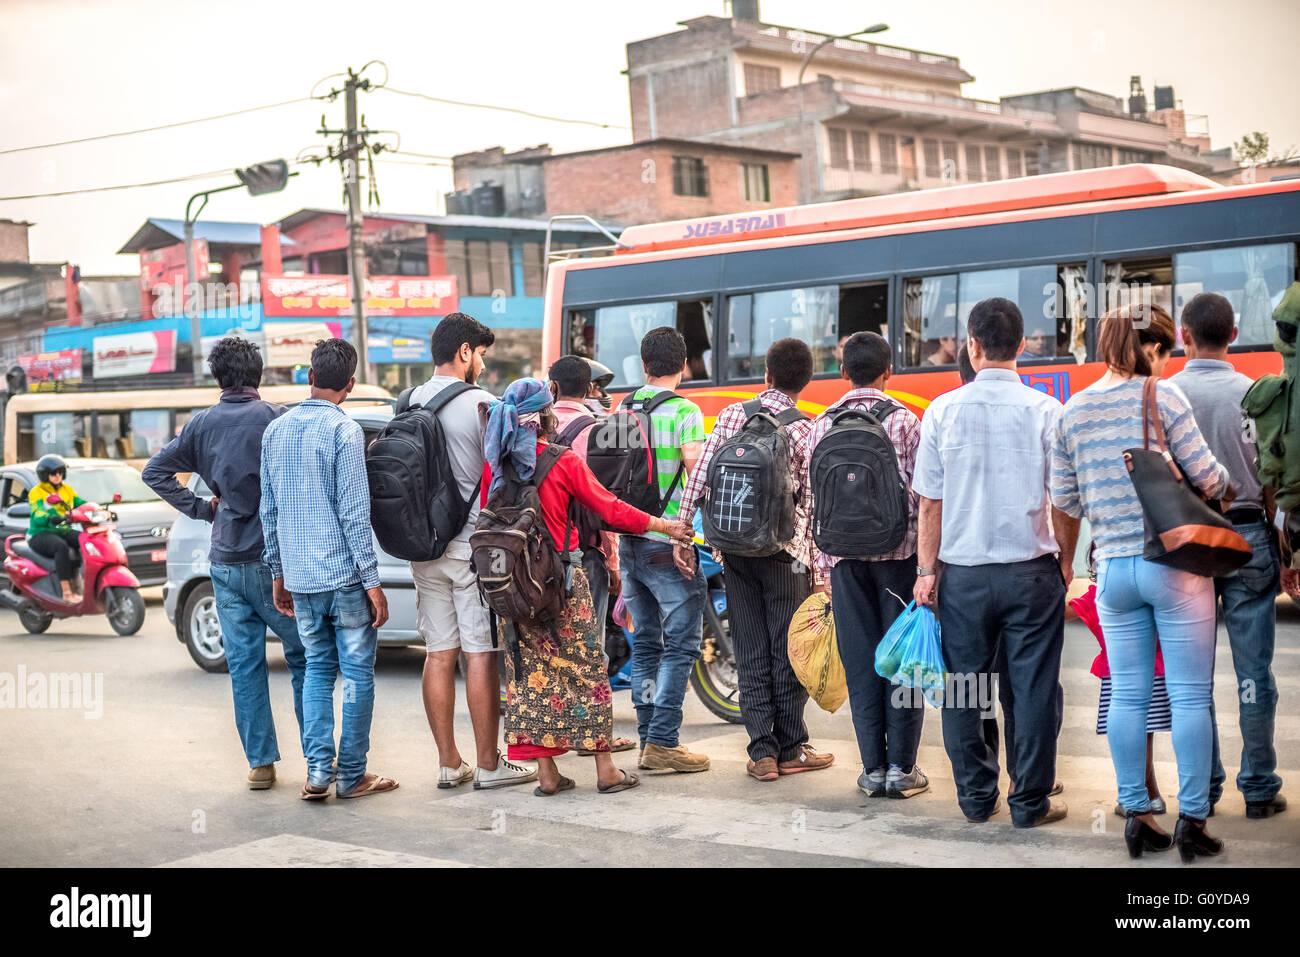 A crowd prepare to cross the busy street of Kathmandu, Nepal. © Reynold Sumayku - Stock Image